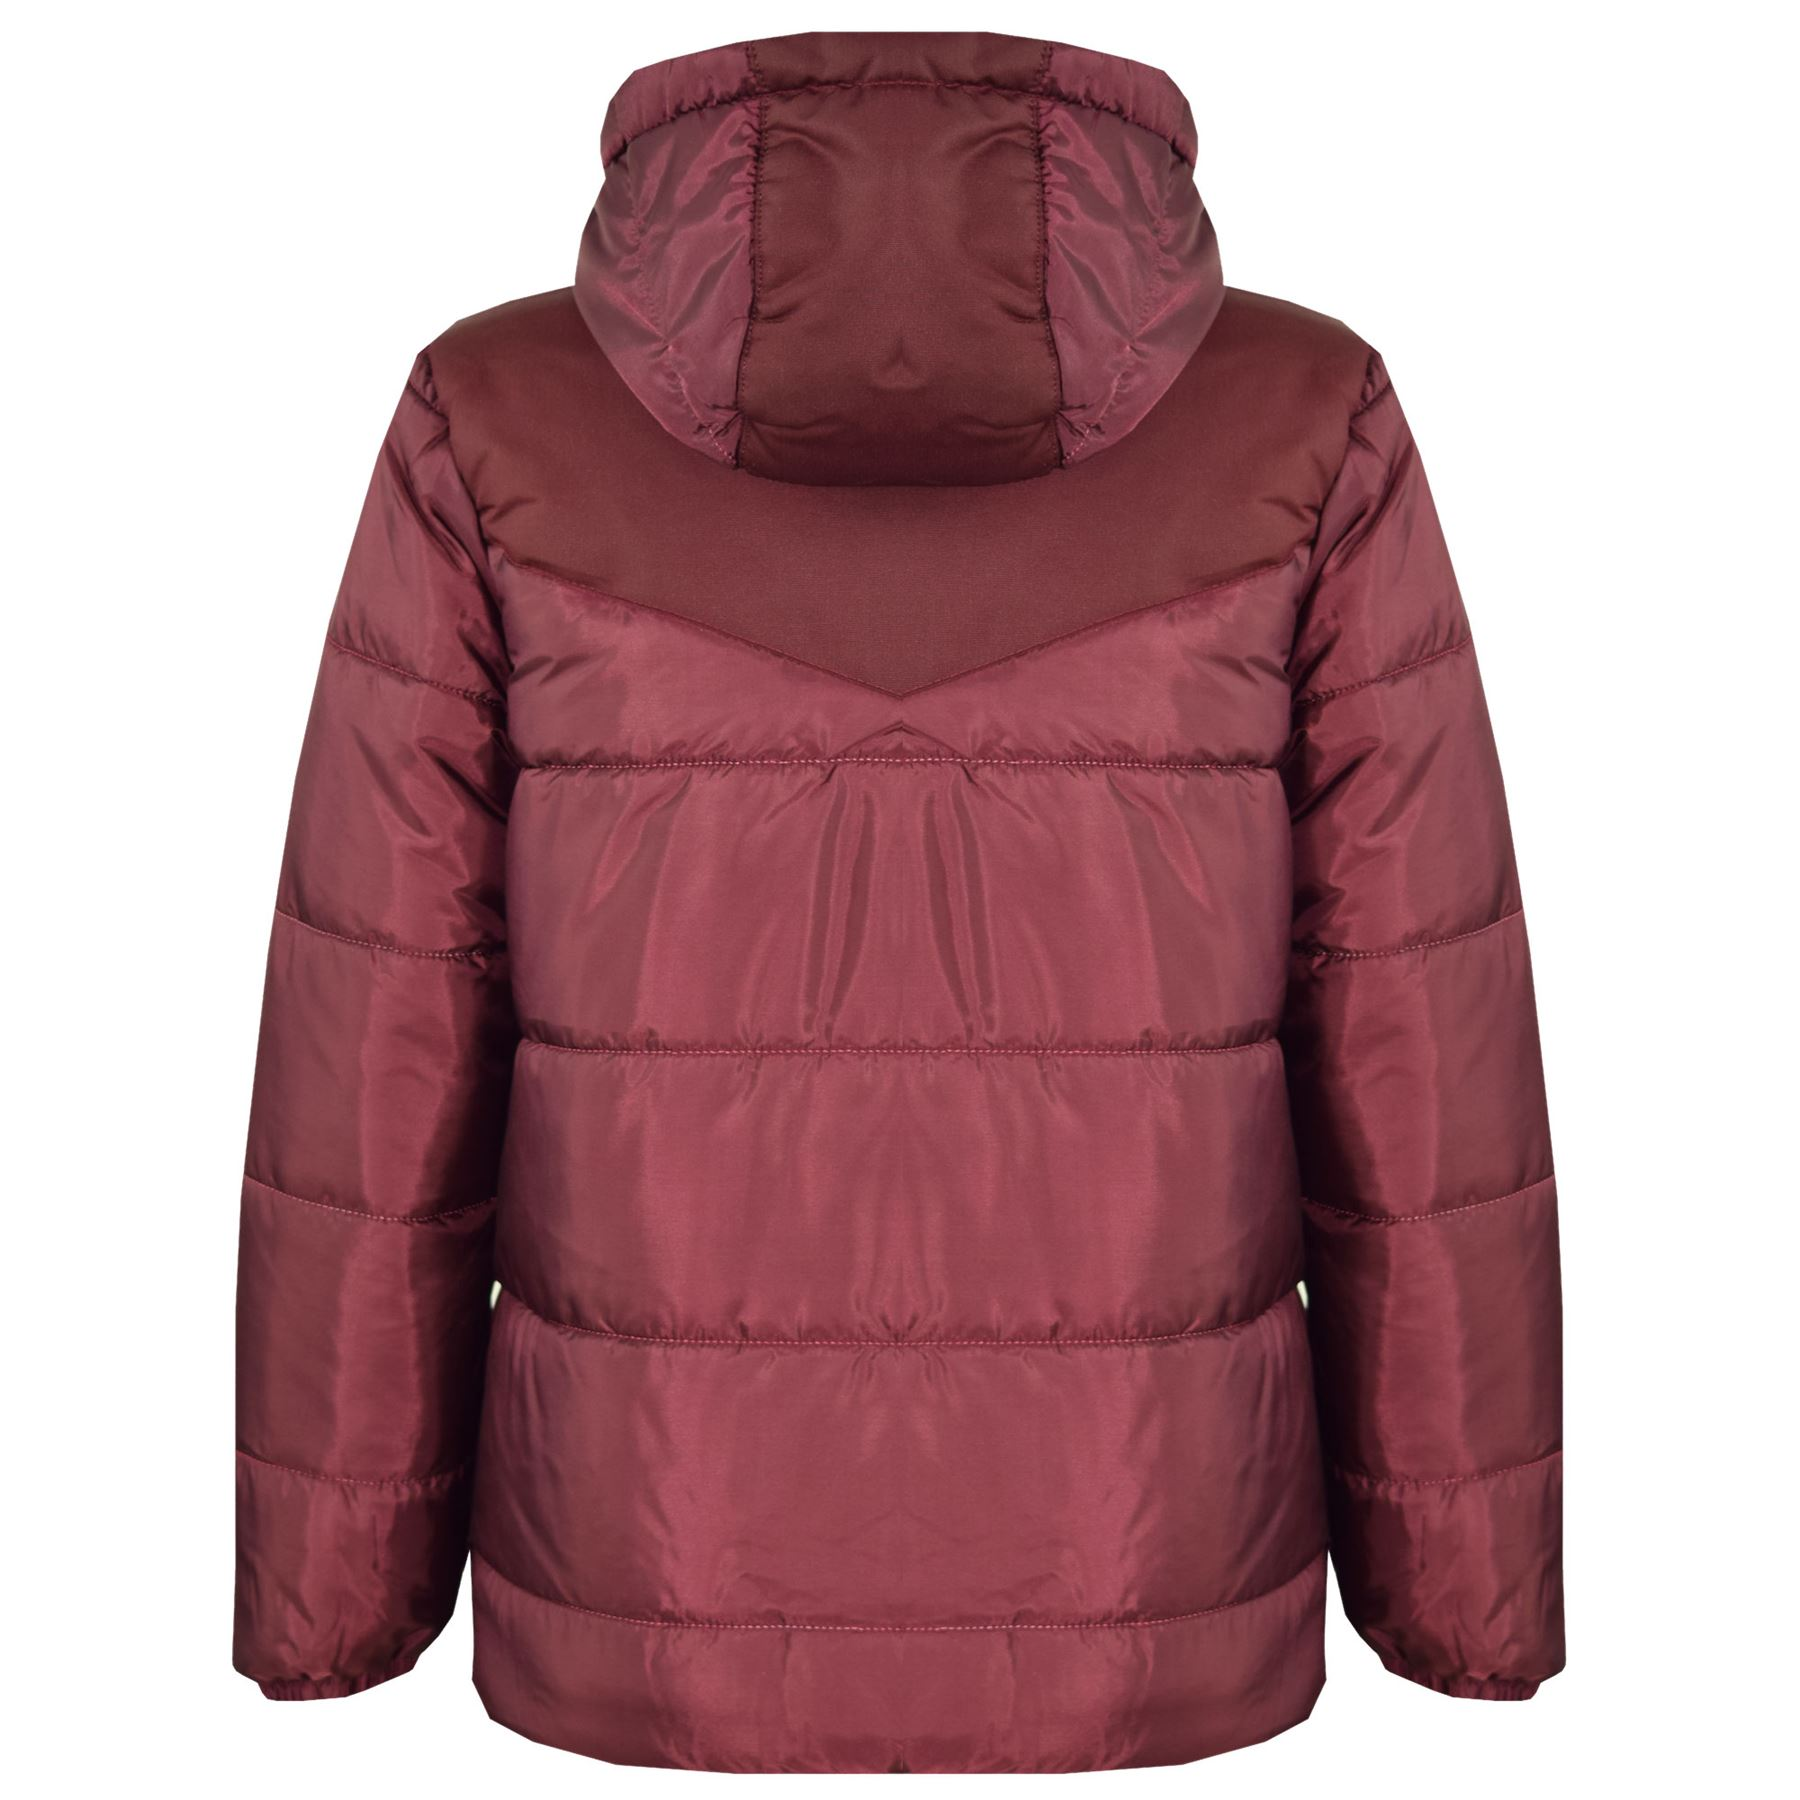 2144b14dce71 Kids Jackets Boys Girls Padded Puffer Bubble Zipped Hooded Warm ...